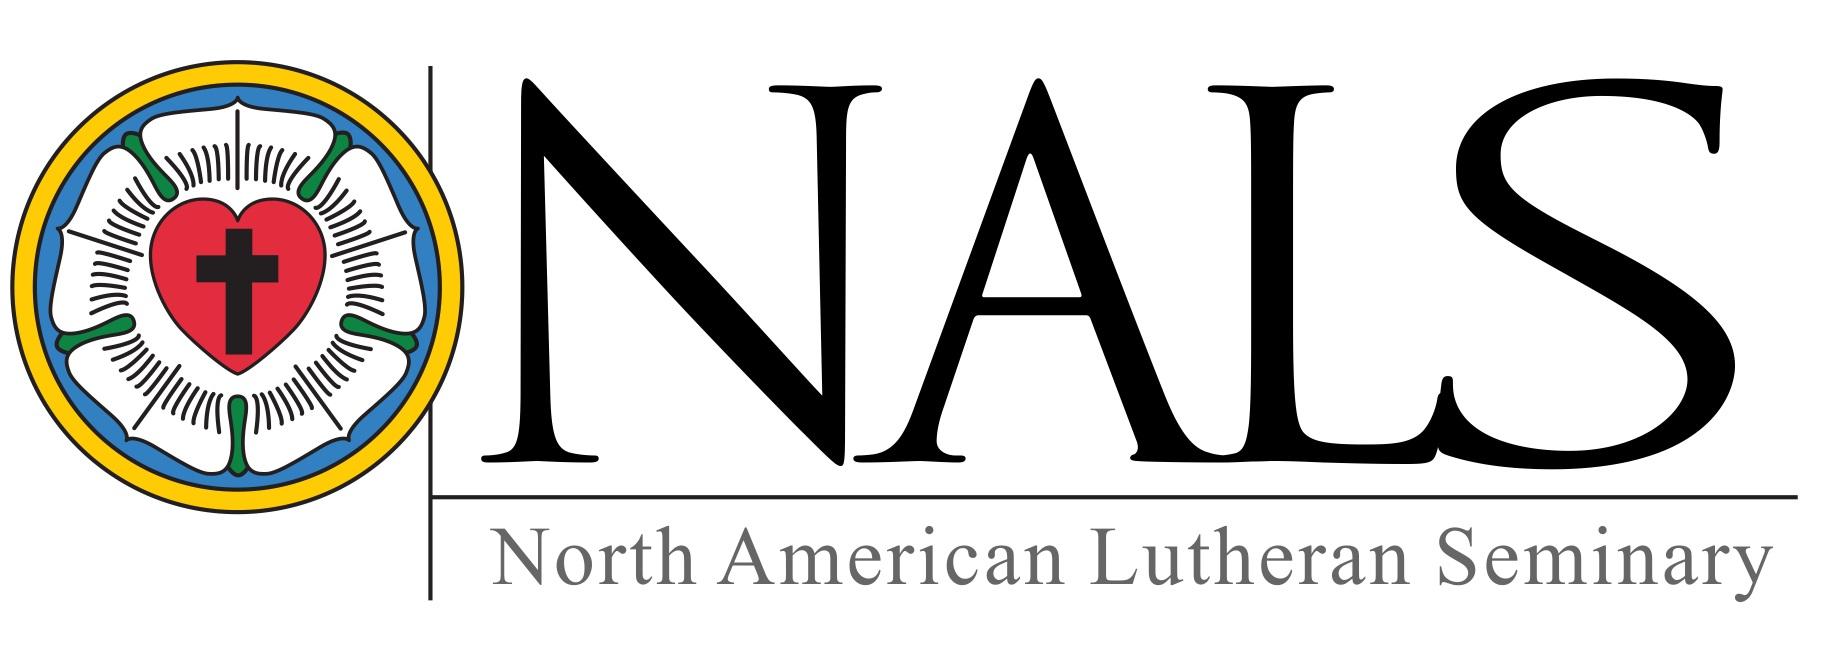 North American Lutheran Seminary Nals North American Lutheran Church